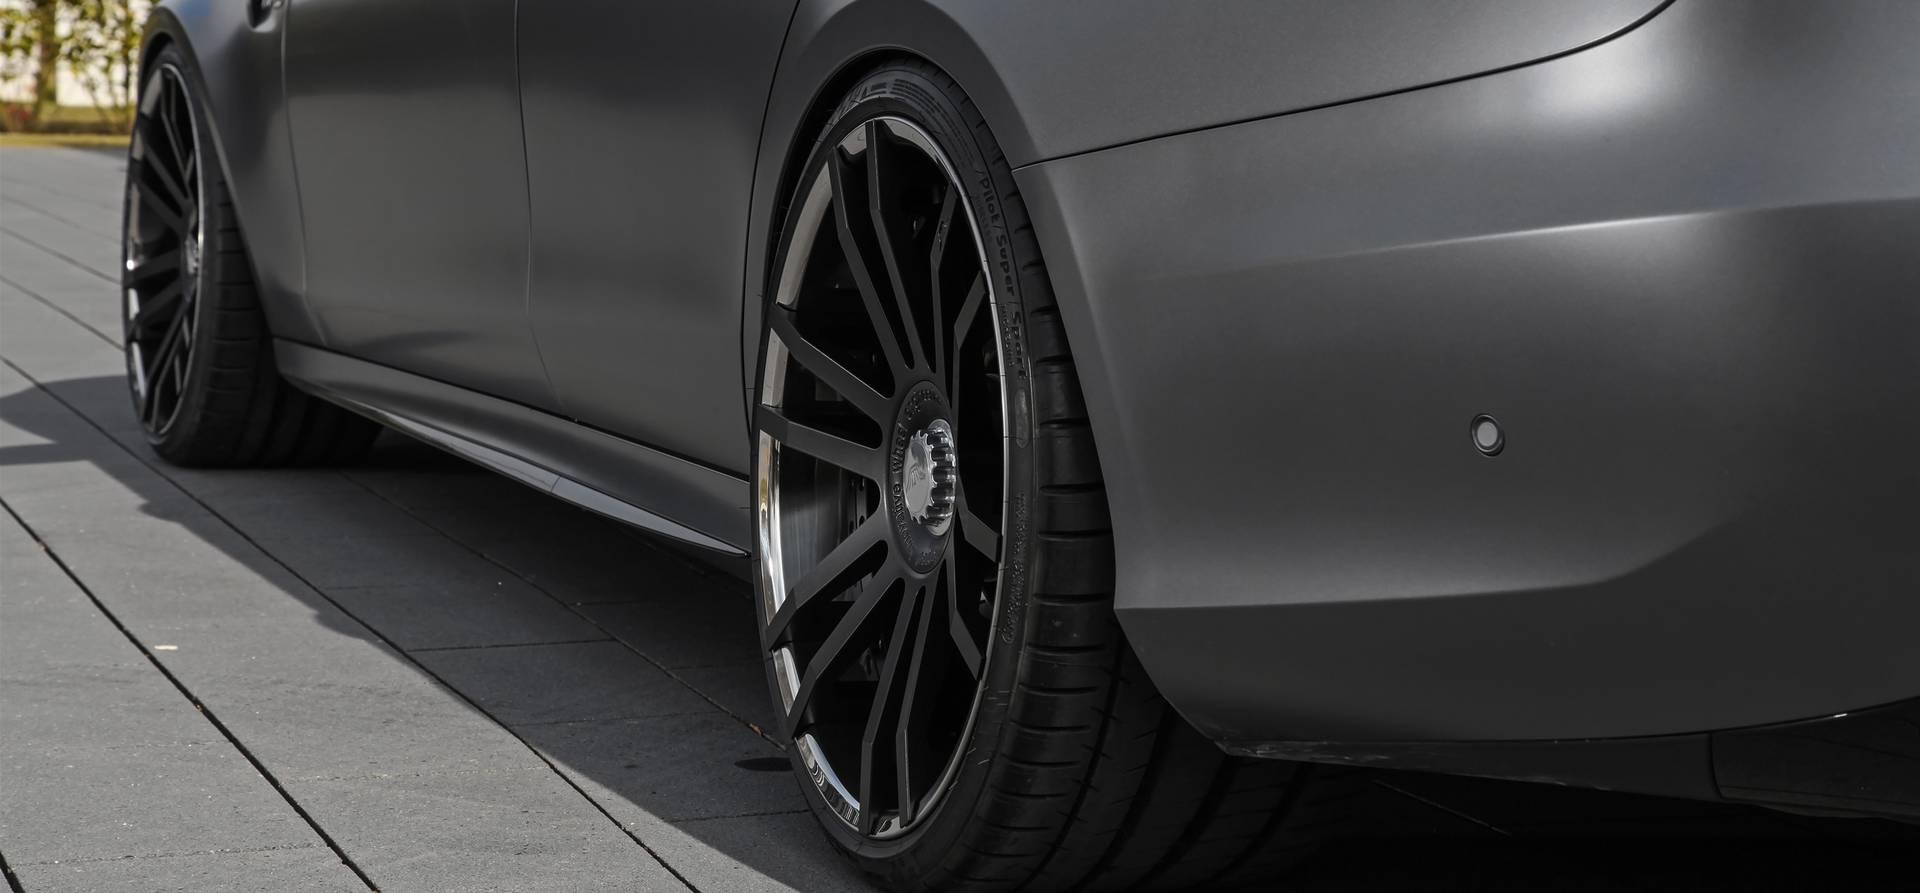 Wheelsandmore предлагают пакет «Stage 3» за 4 999 евро, включач немецкий НДС в размере 19%.